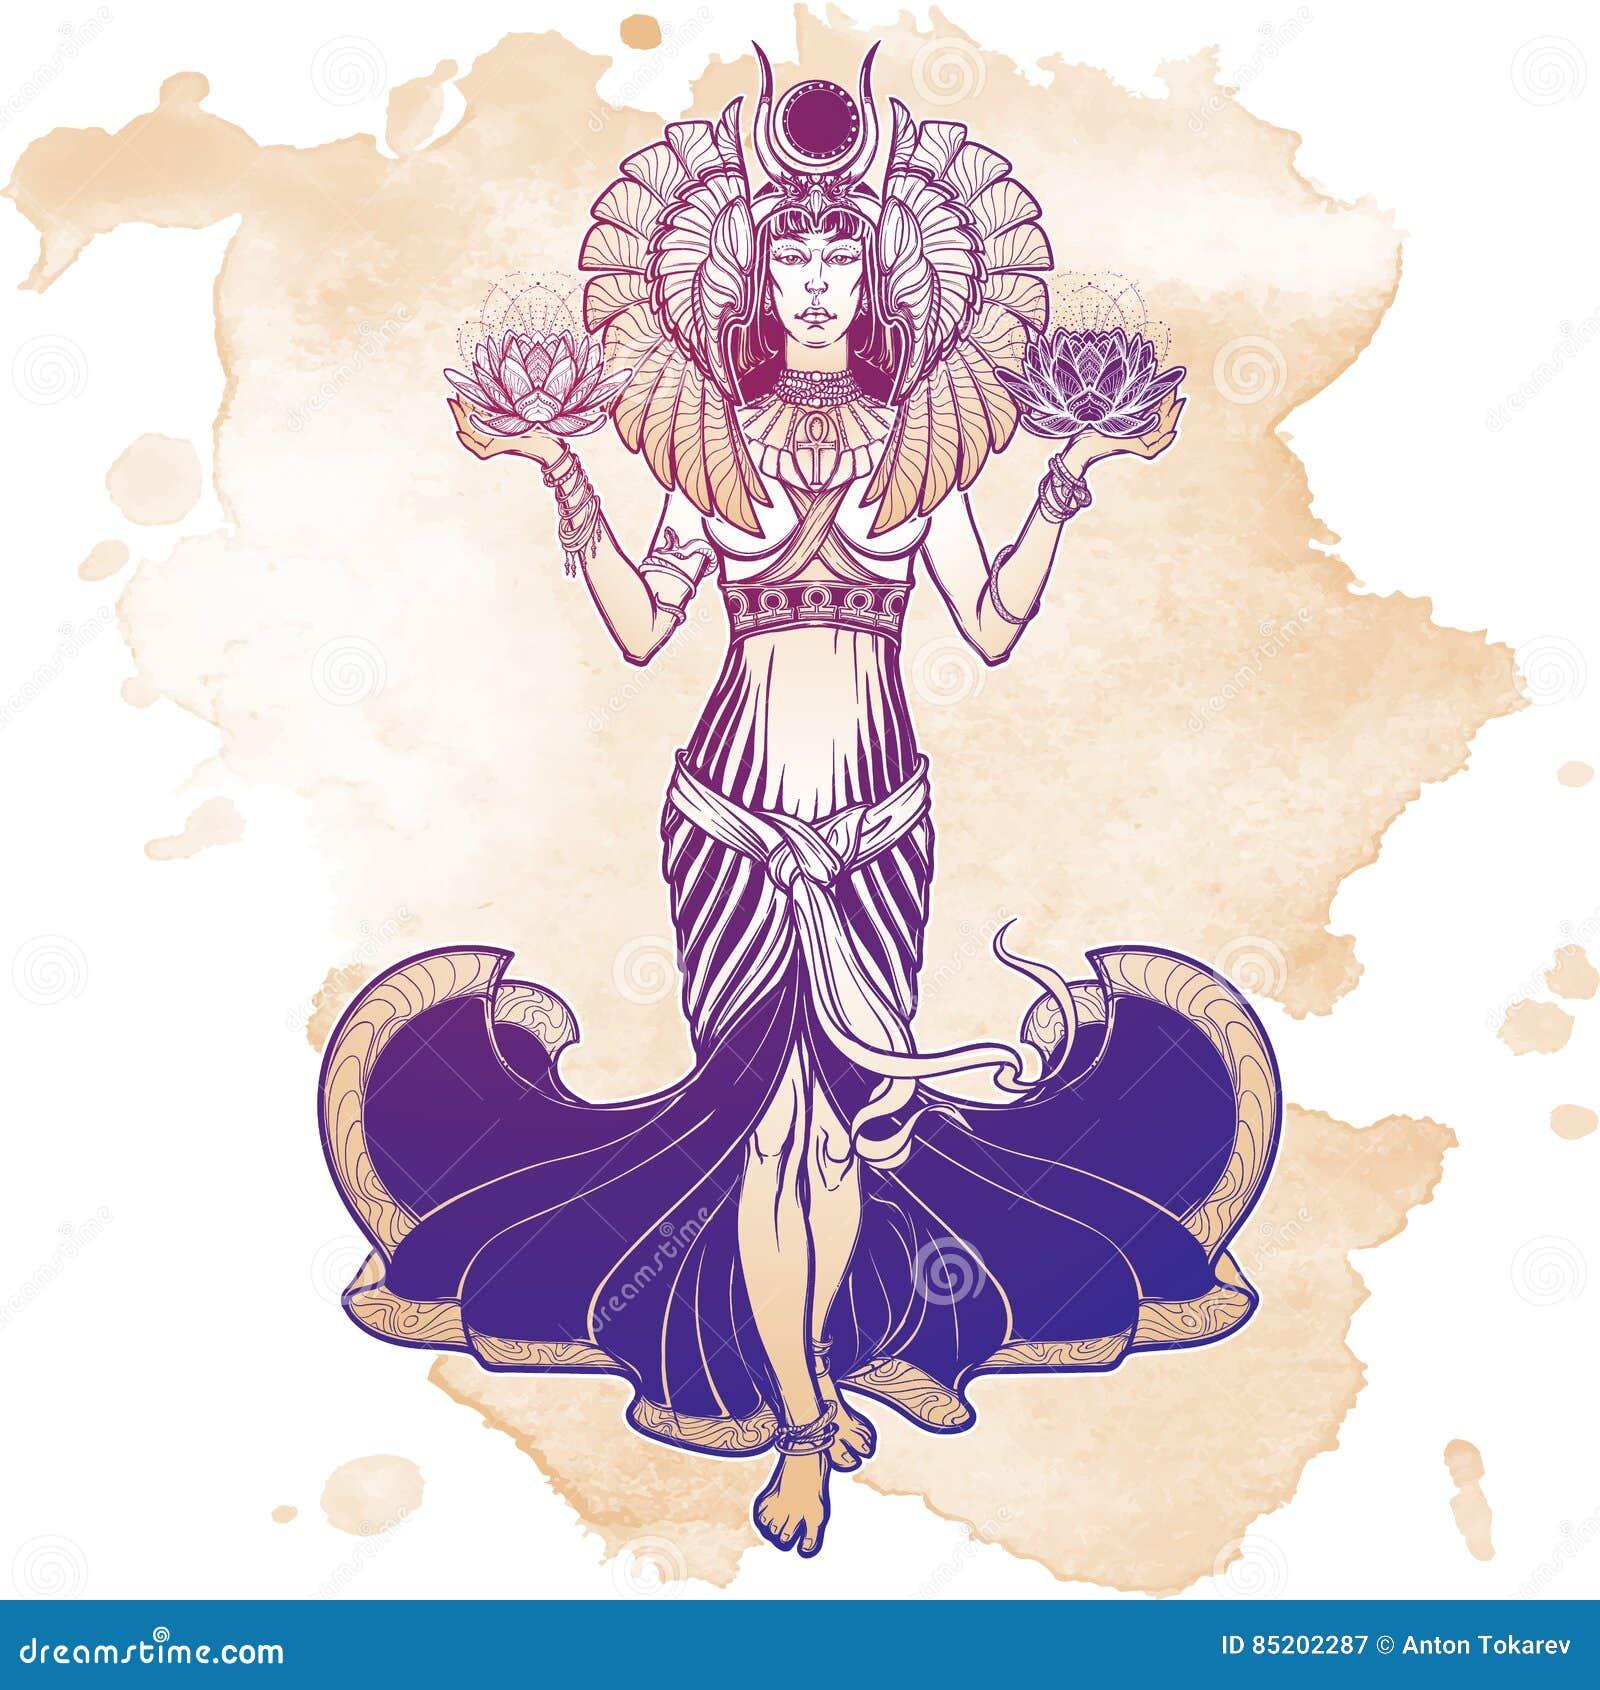 Illustration Of Libra Zodiac Sign As A Beautiful Egyptian Goddess